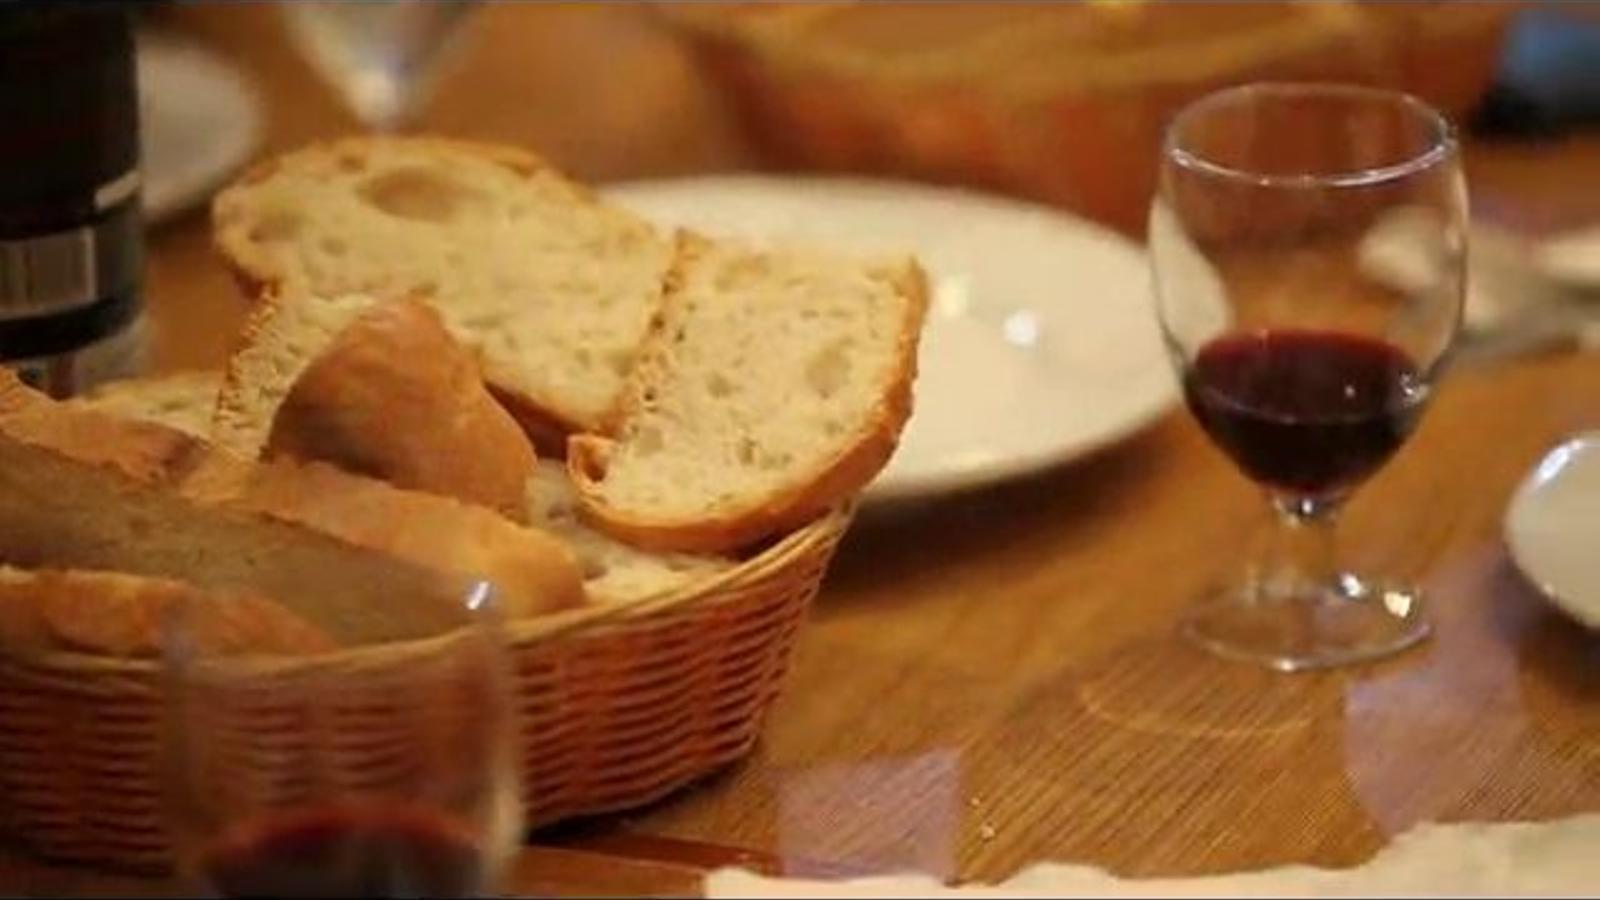 Videoclip de 'Siau qui sou', de Taverners, en exclusiva a l'ARA Balears